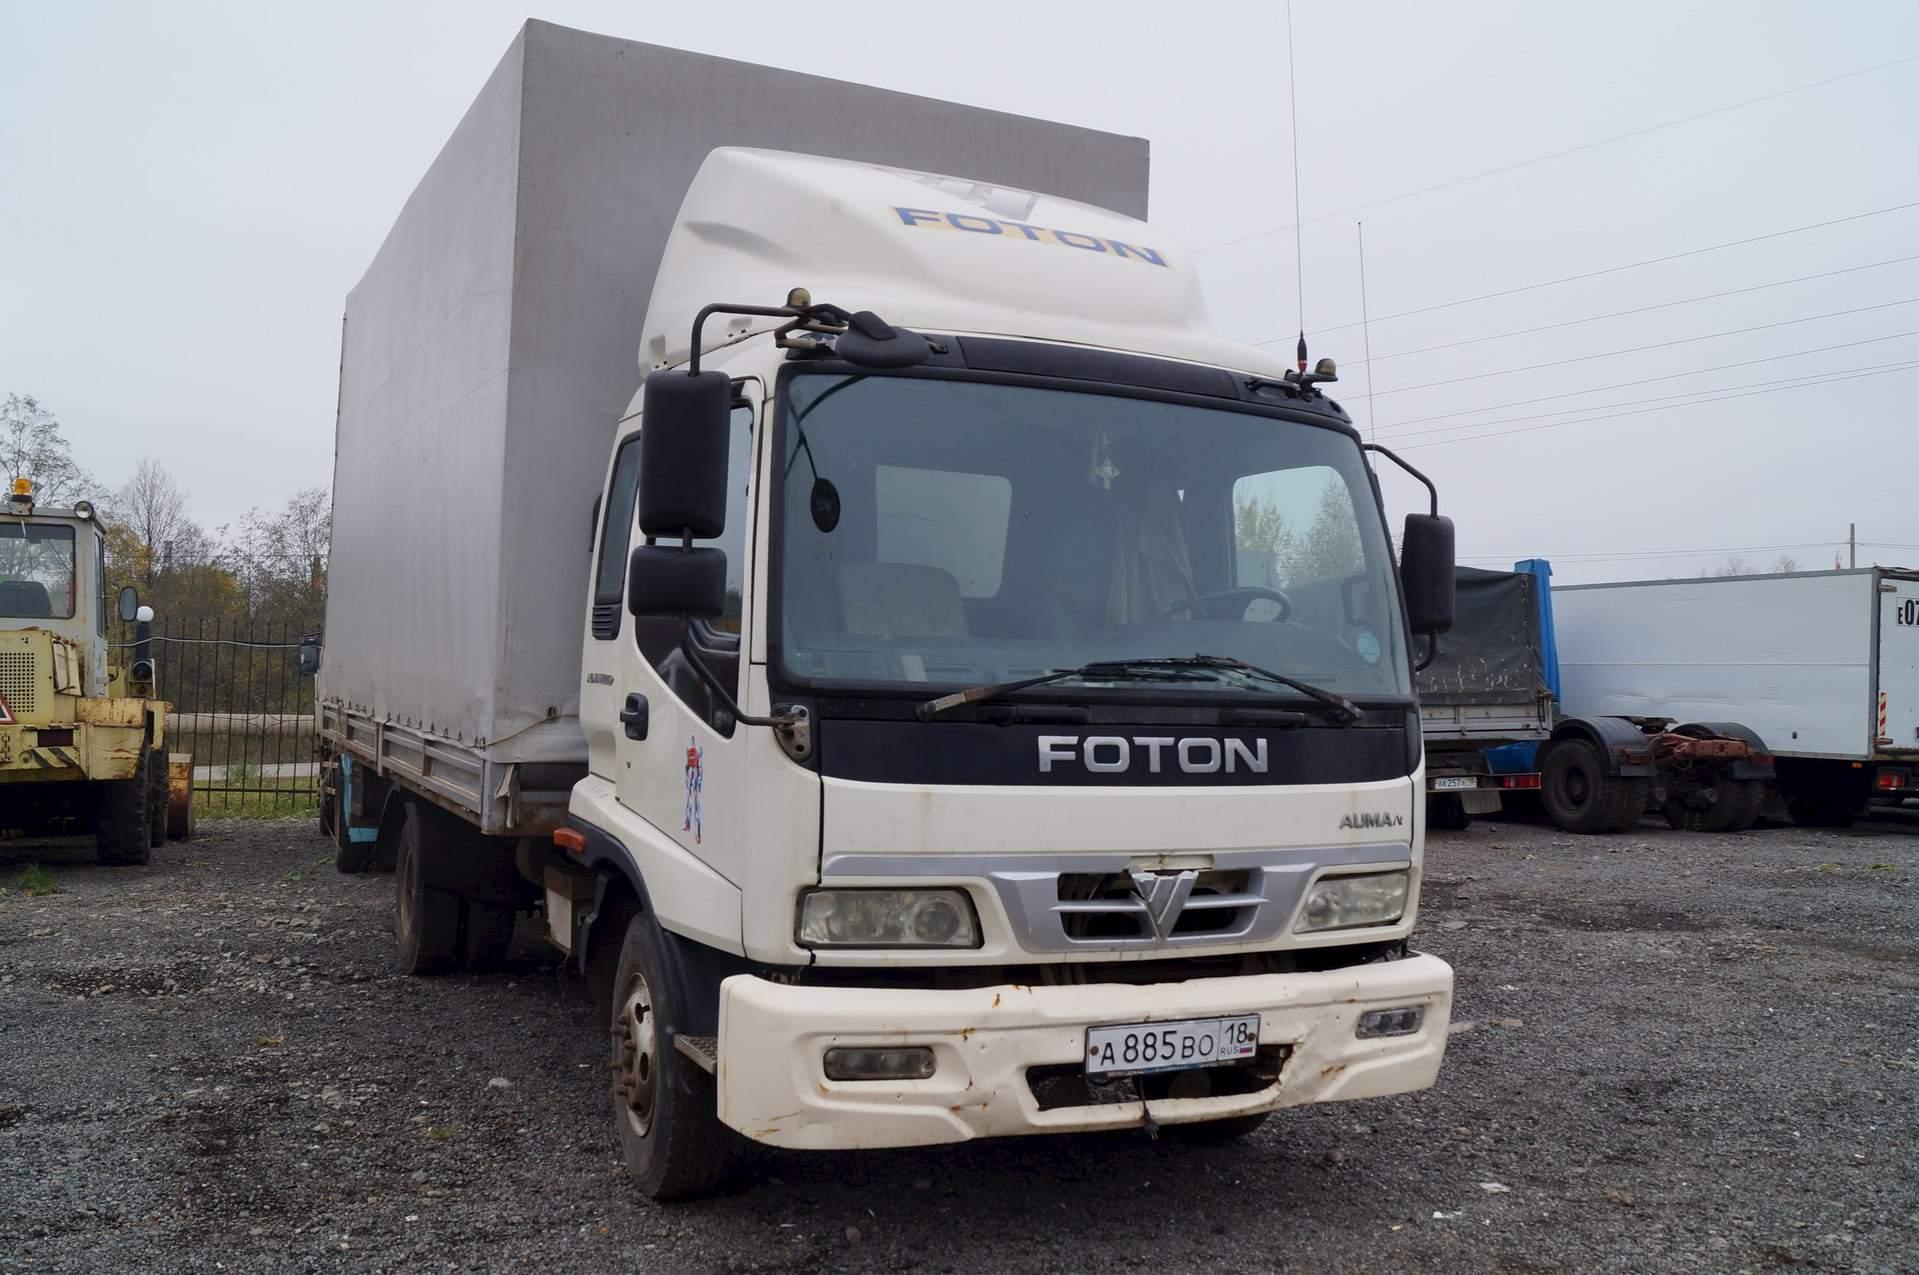 Foton trucks in pakistan 49